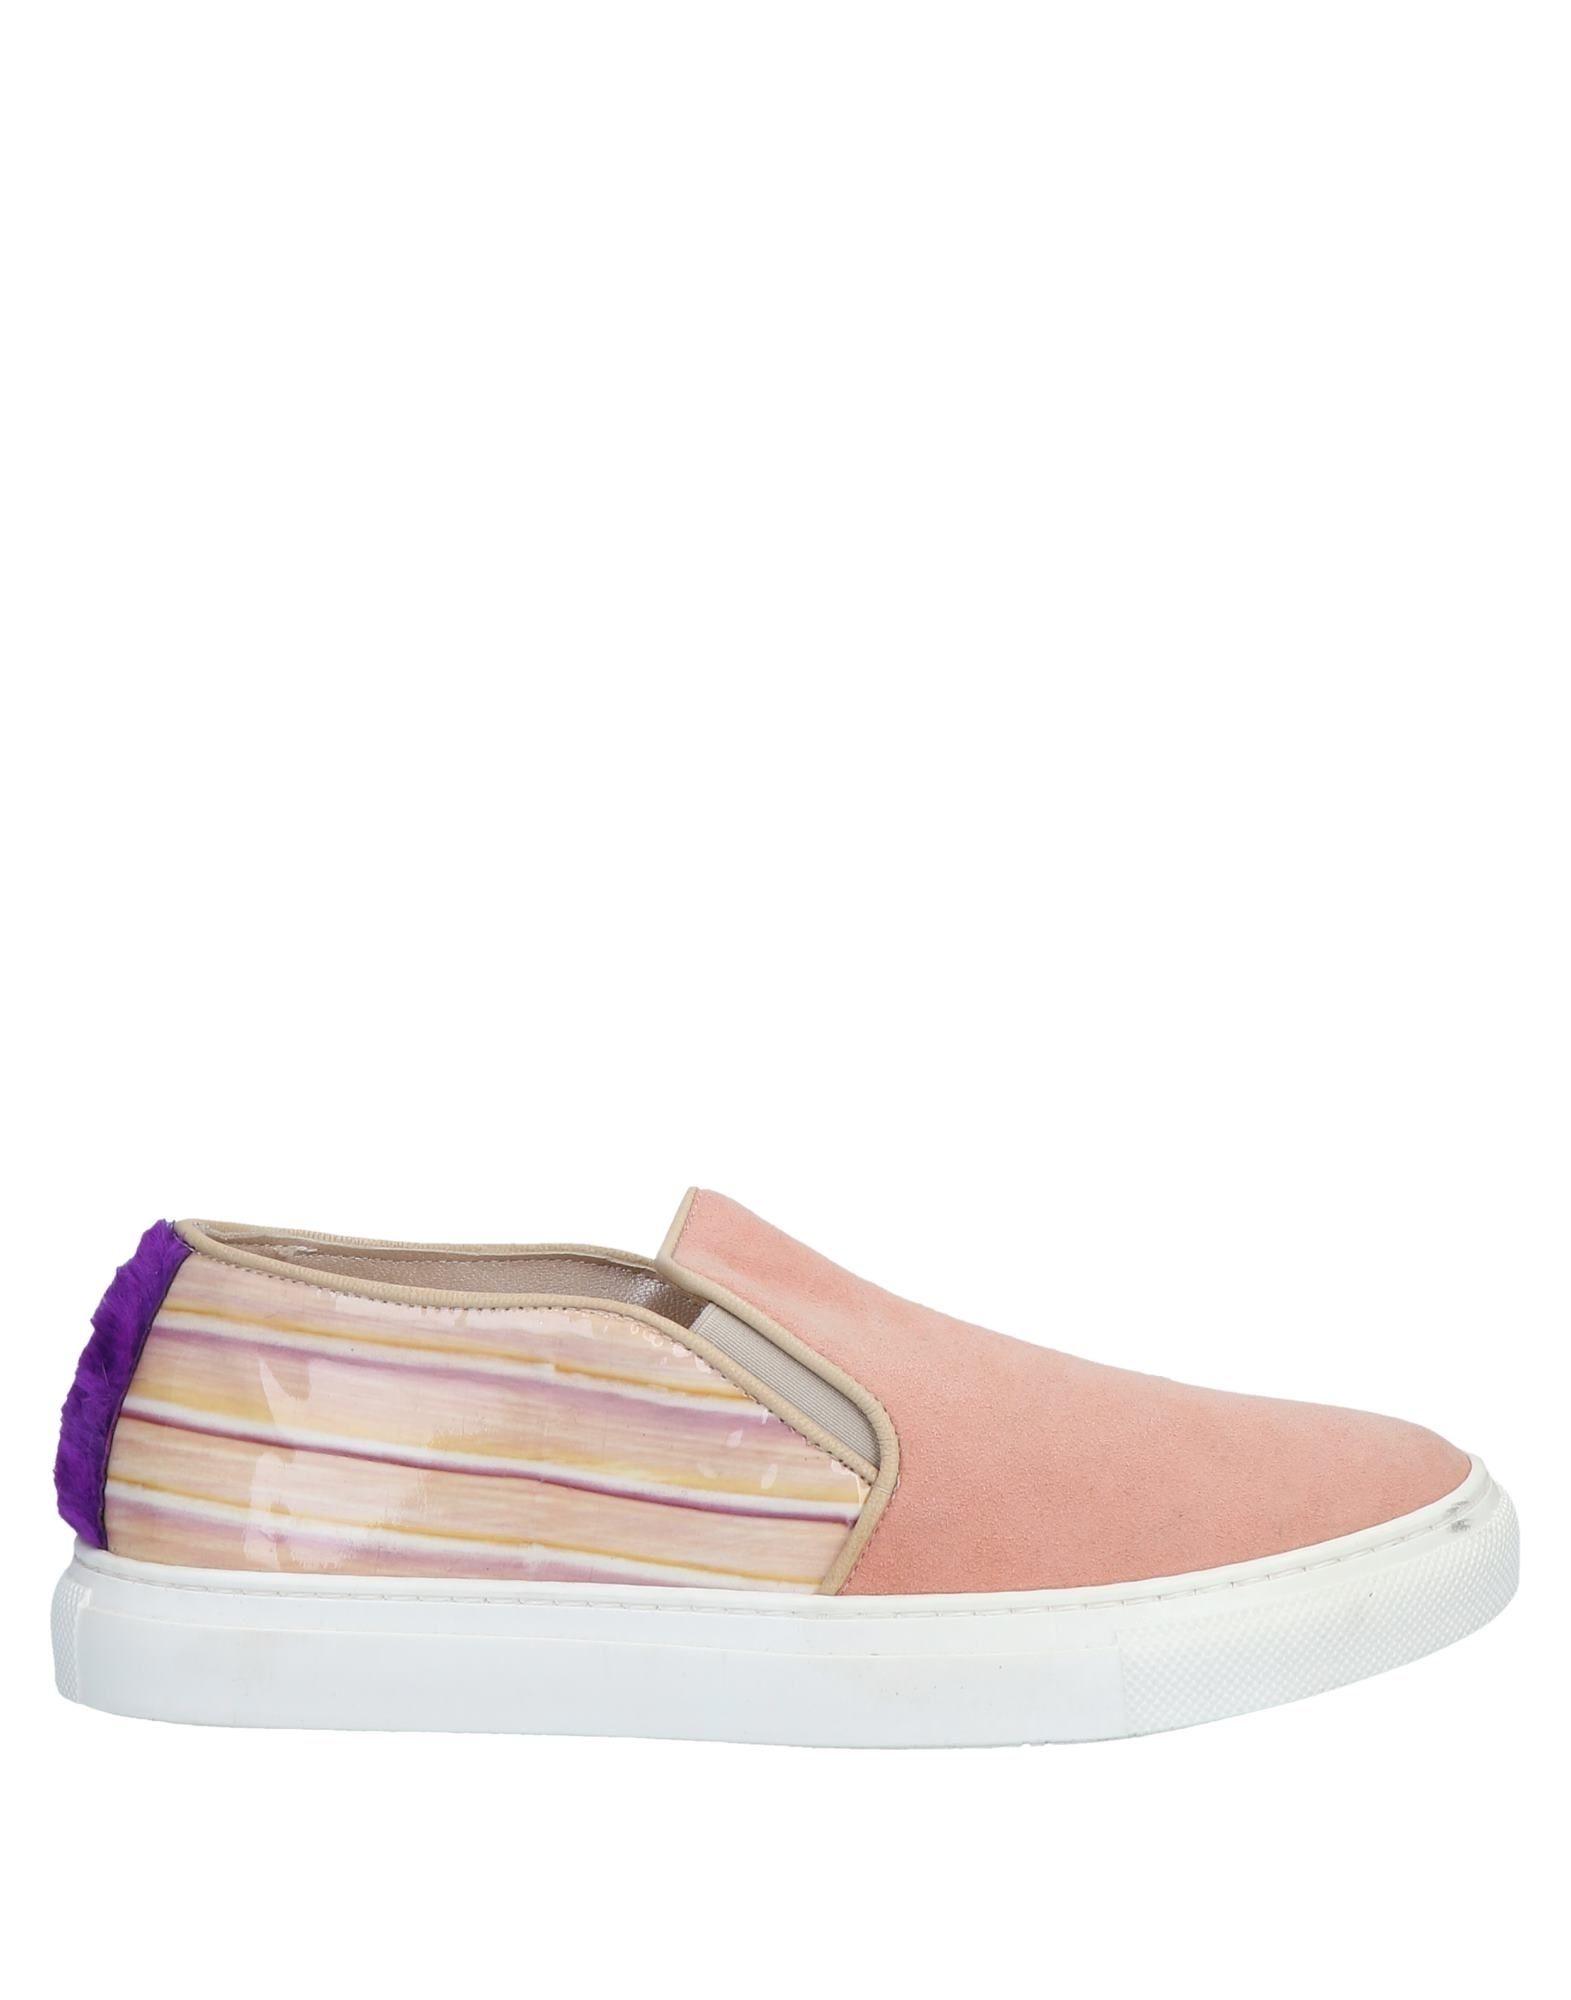 Ebarrito on Sneakers - Women Ebarrito Sneakers online on Ebarrito  Australia - 11555032GJ b319ec